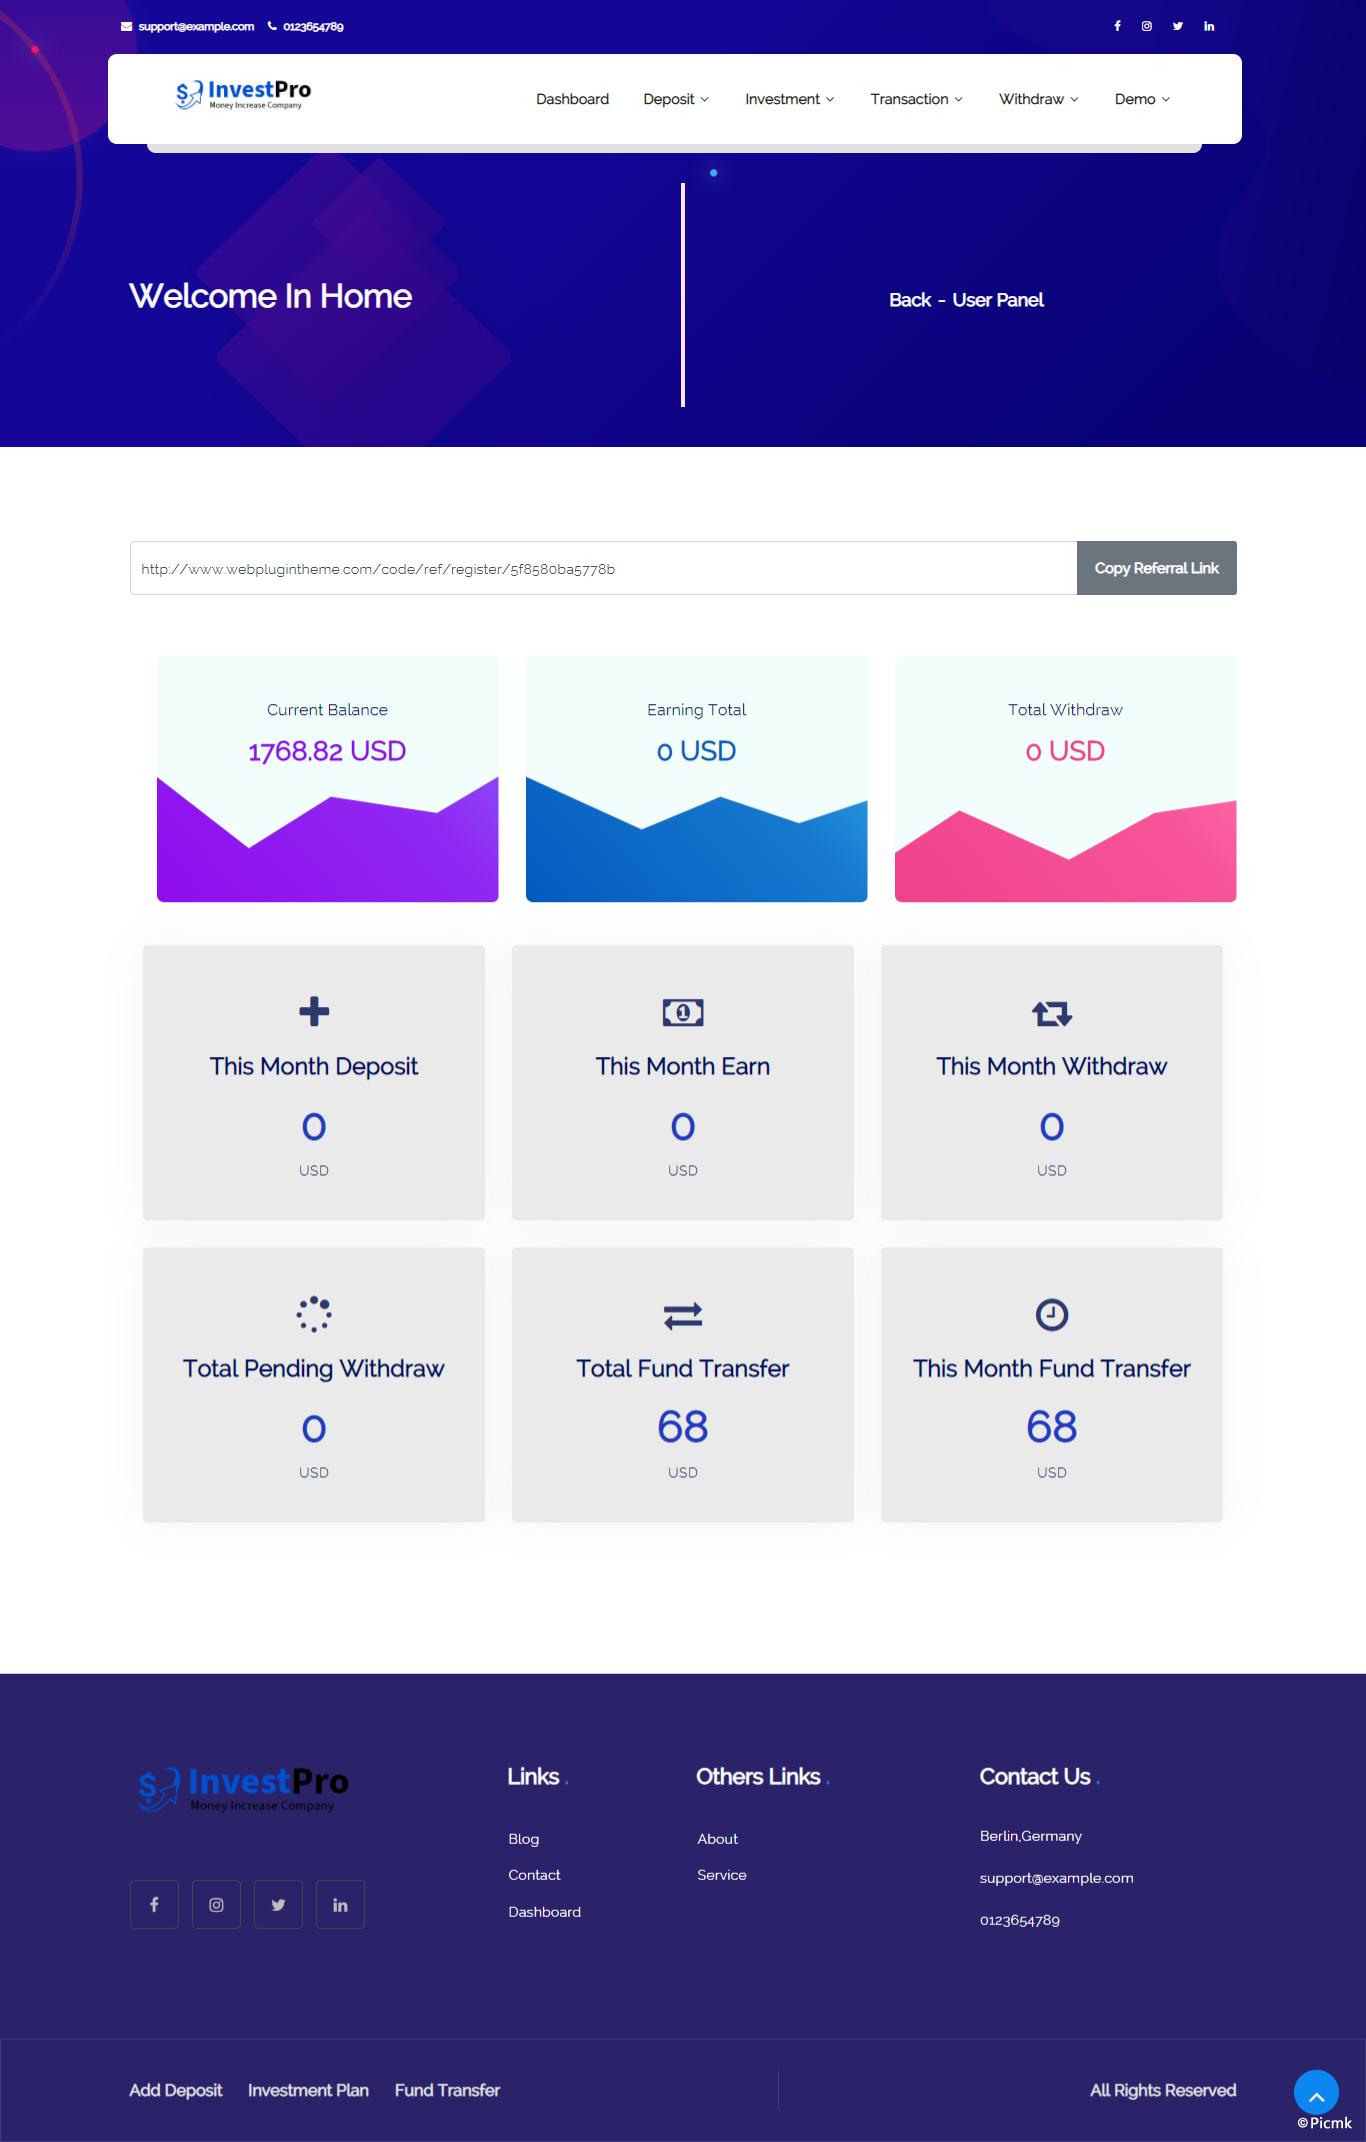 InvestPro - PHP在线钱包/银行投资平台插图5